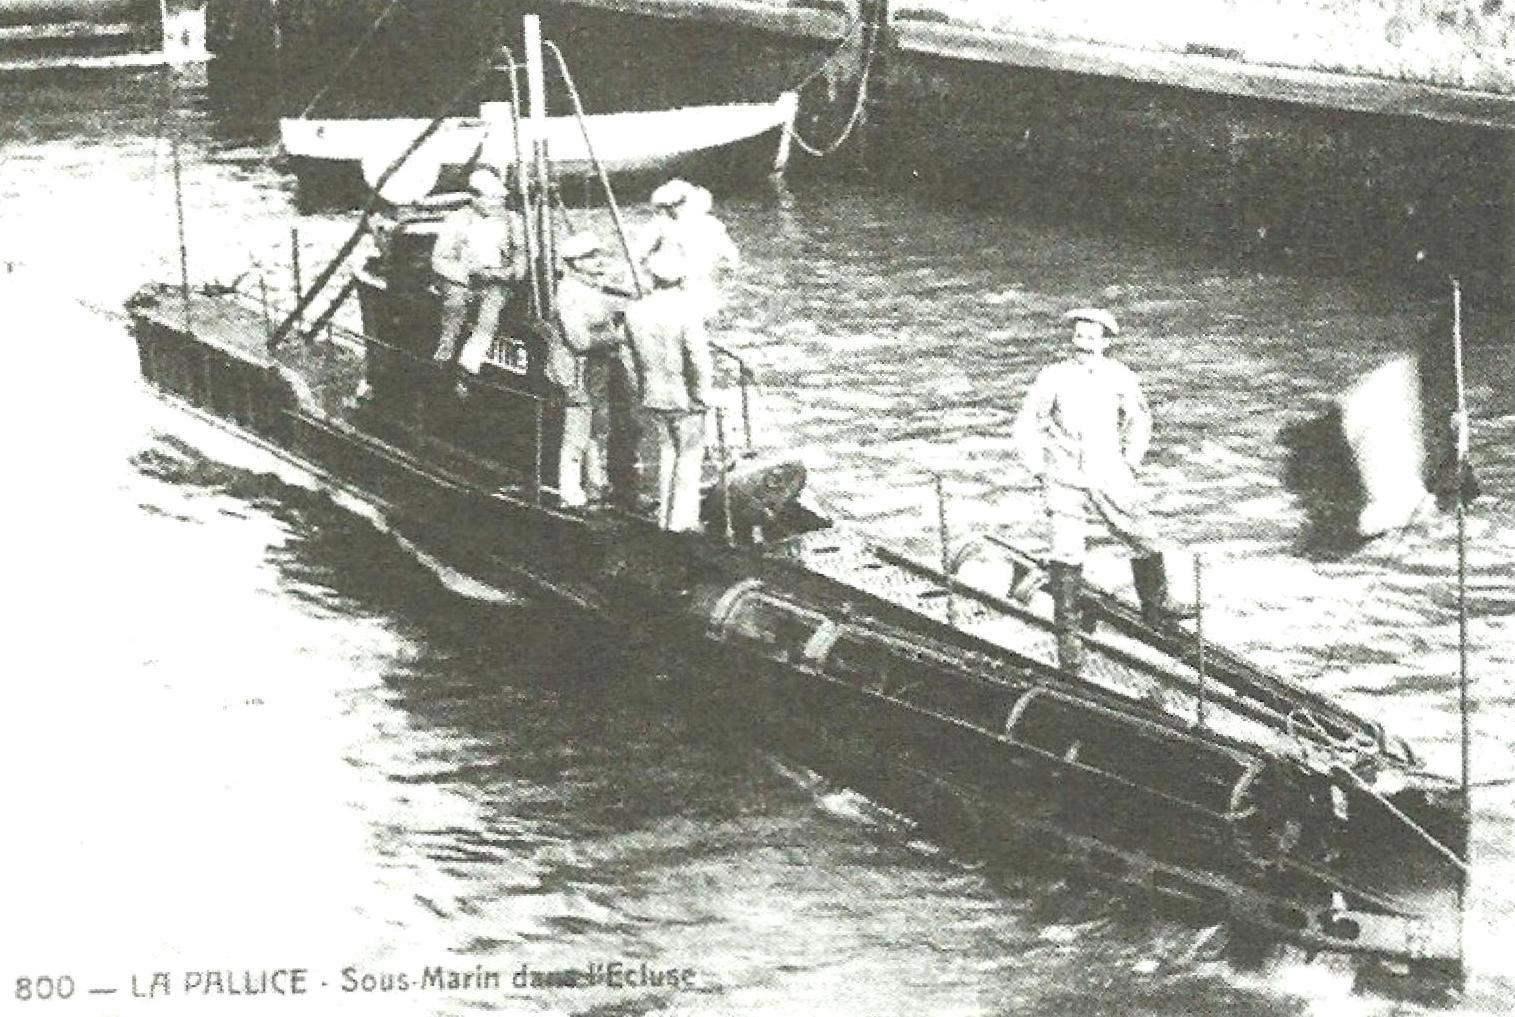 Подводная лодка «Наяд» Г. Ромазотти, Франция, 1904 г.